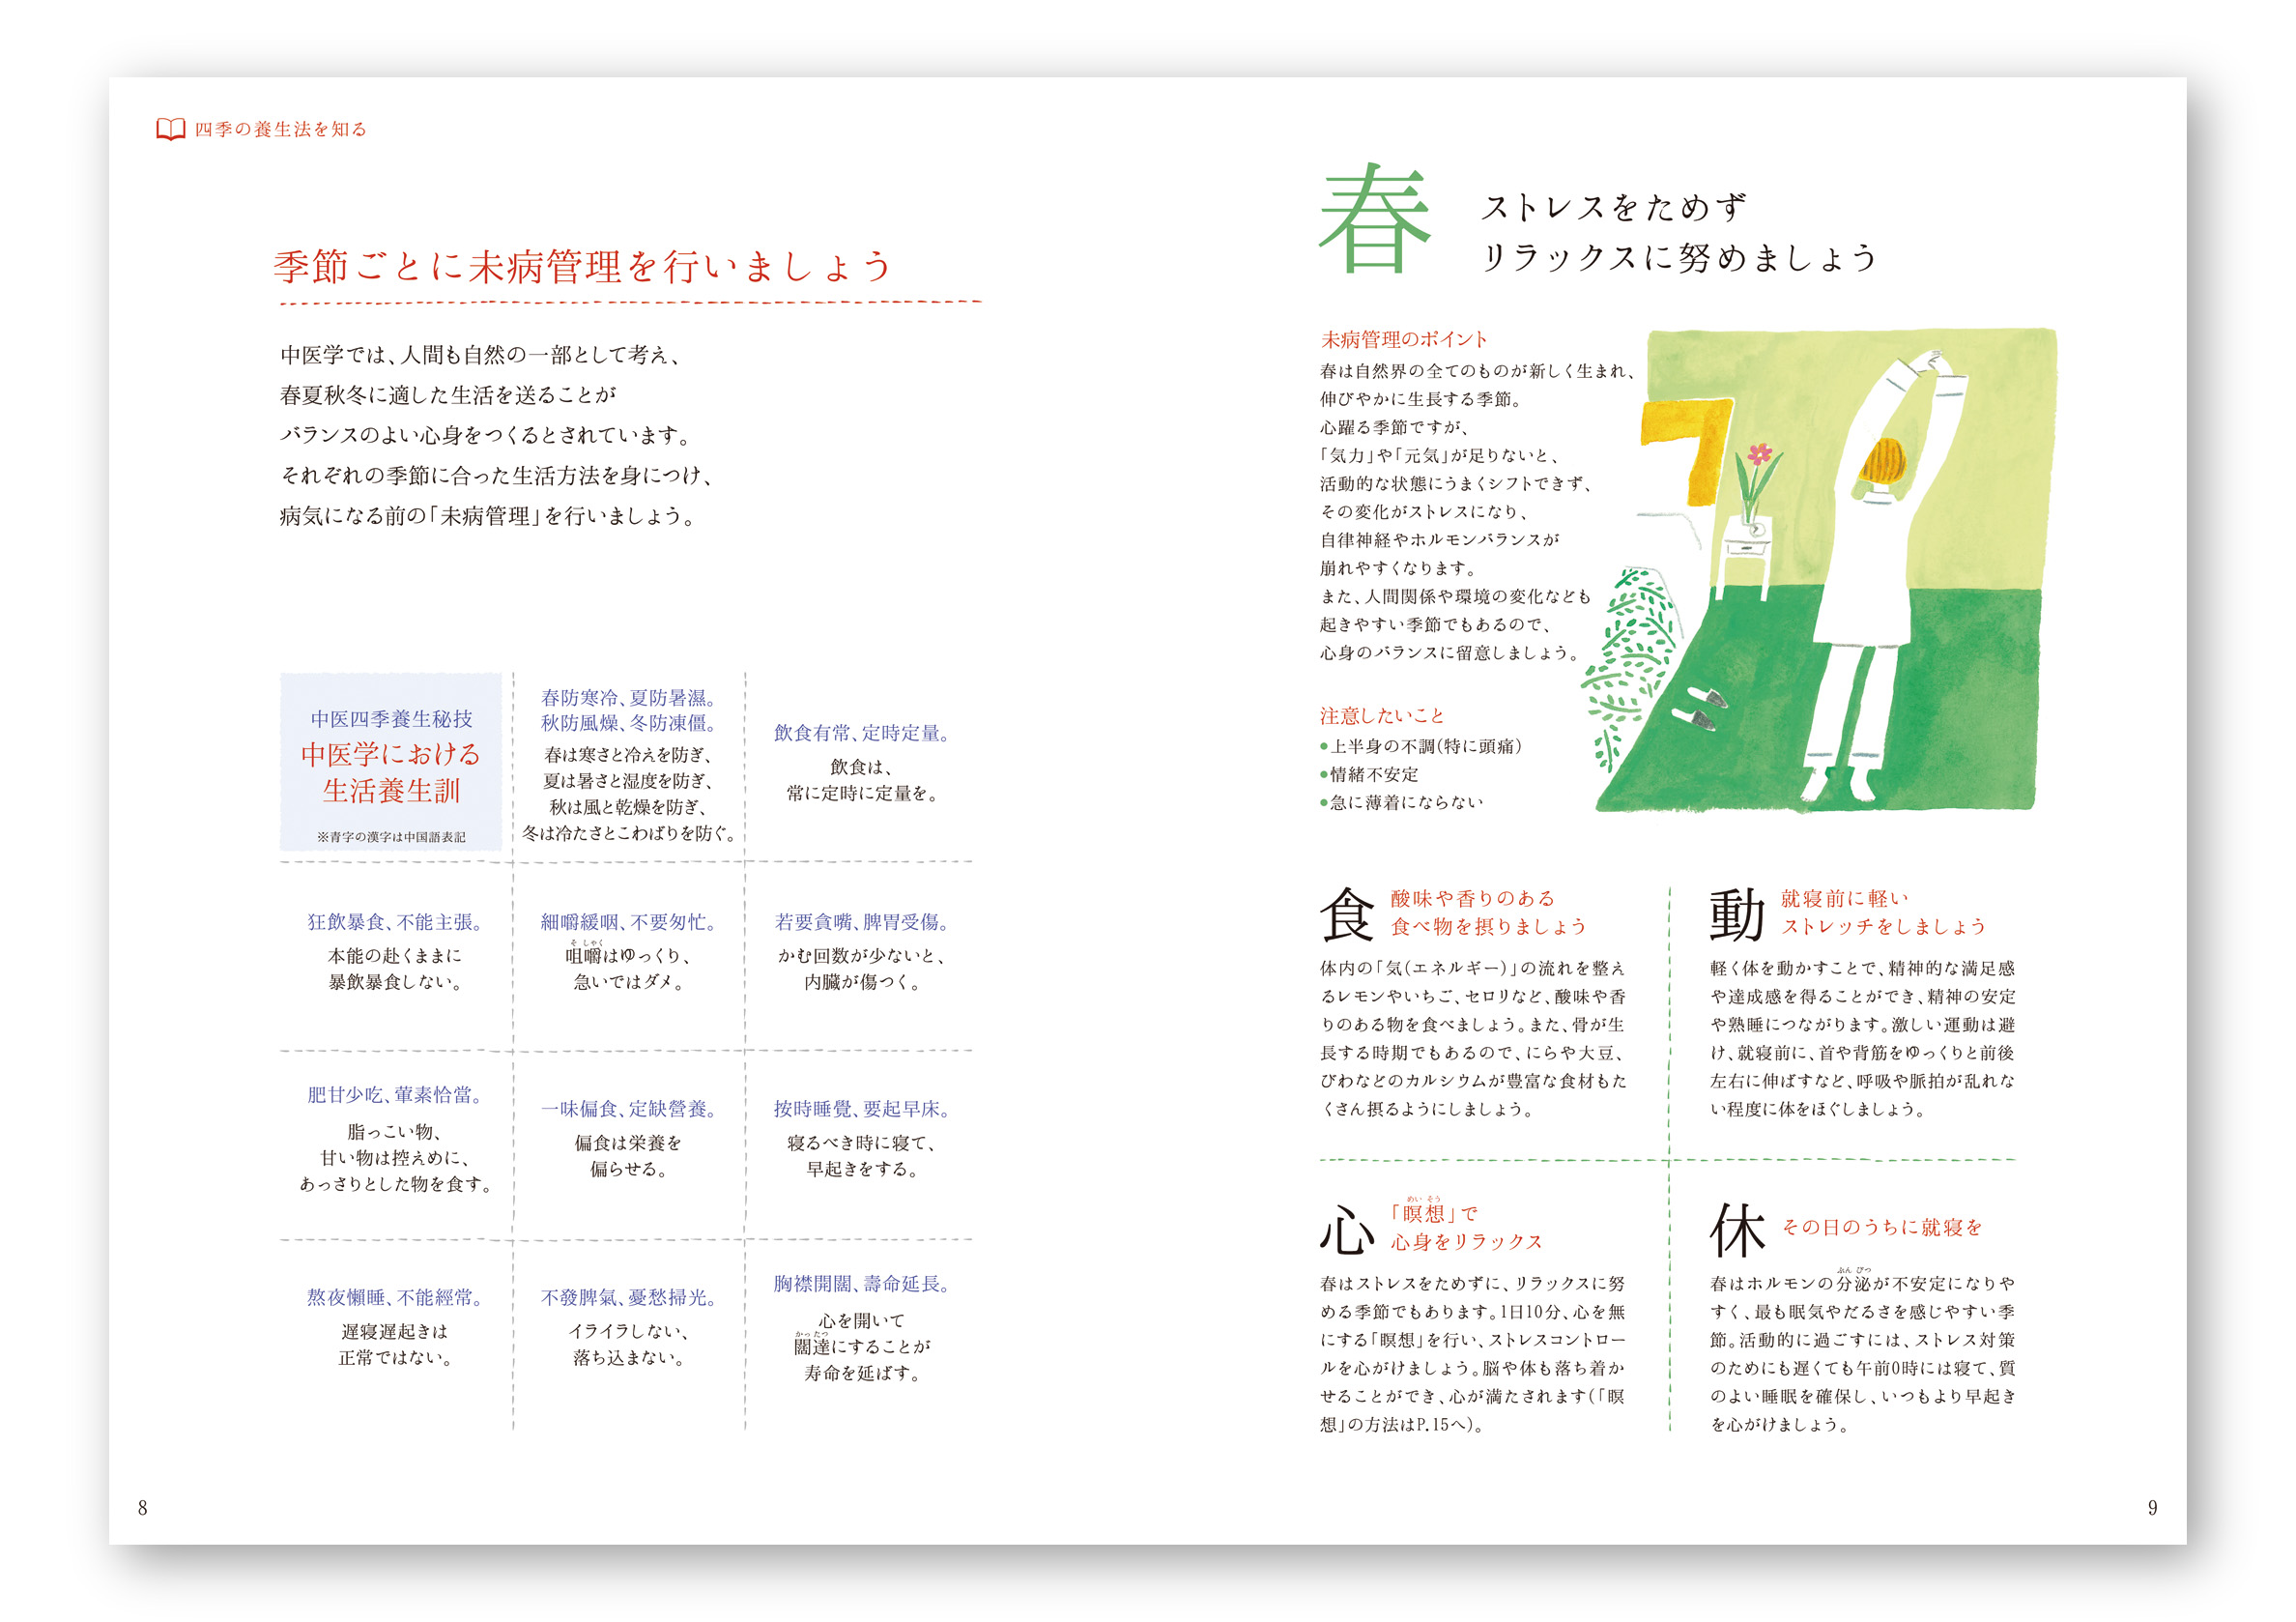 08_09C.jpg